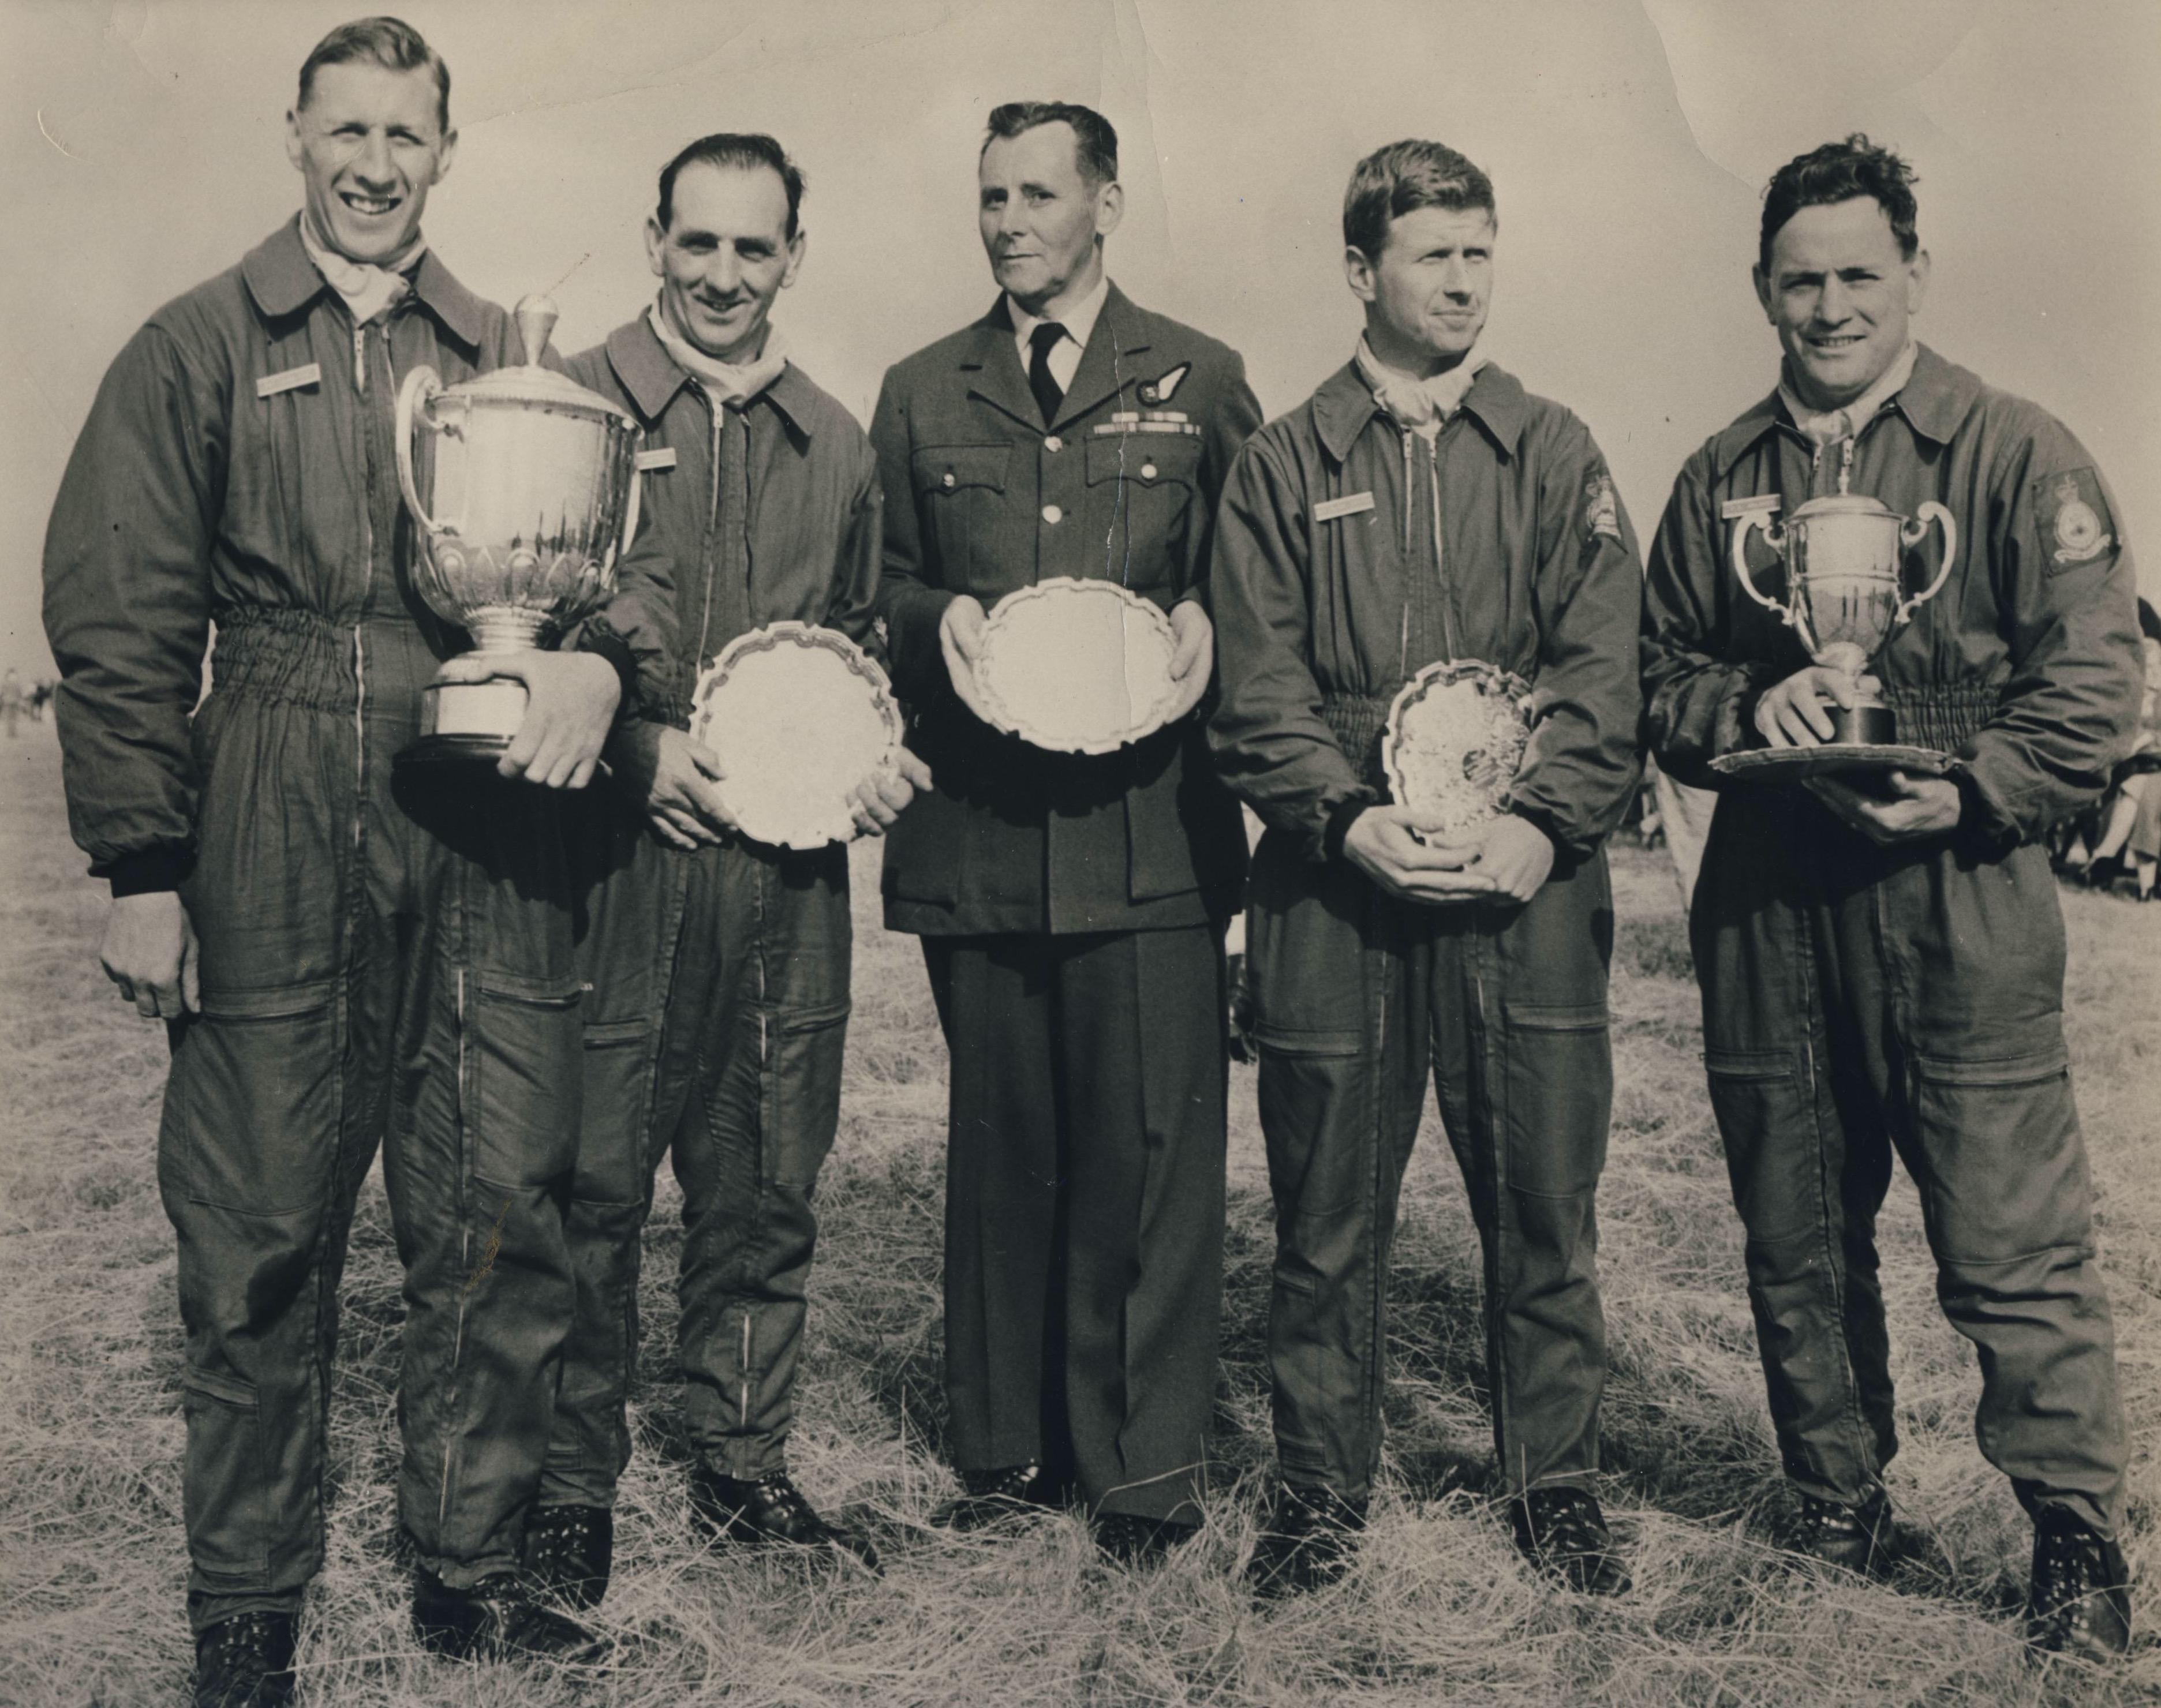 RAF TEAM 1964